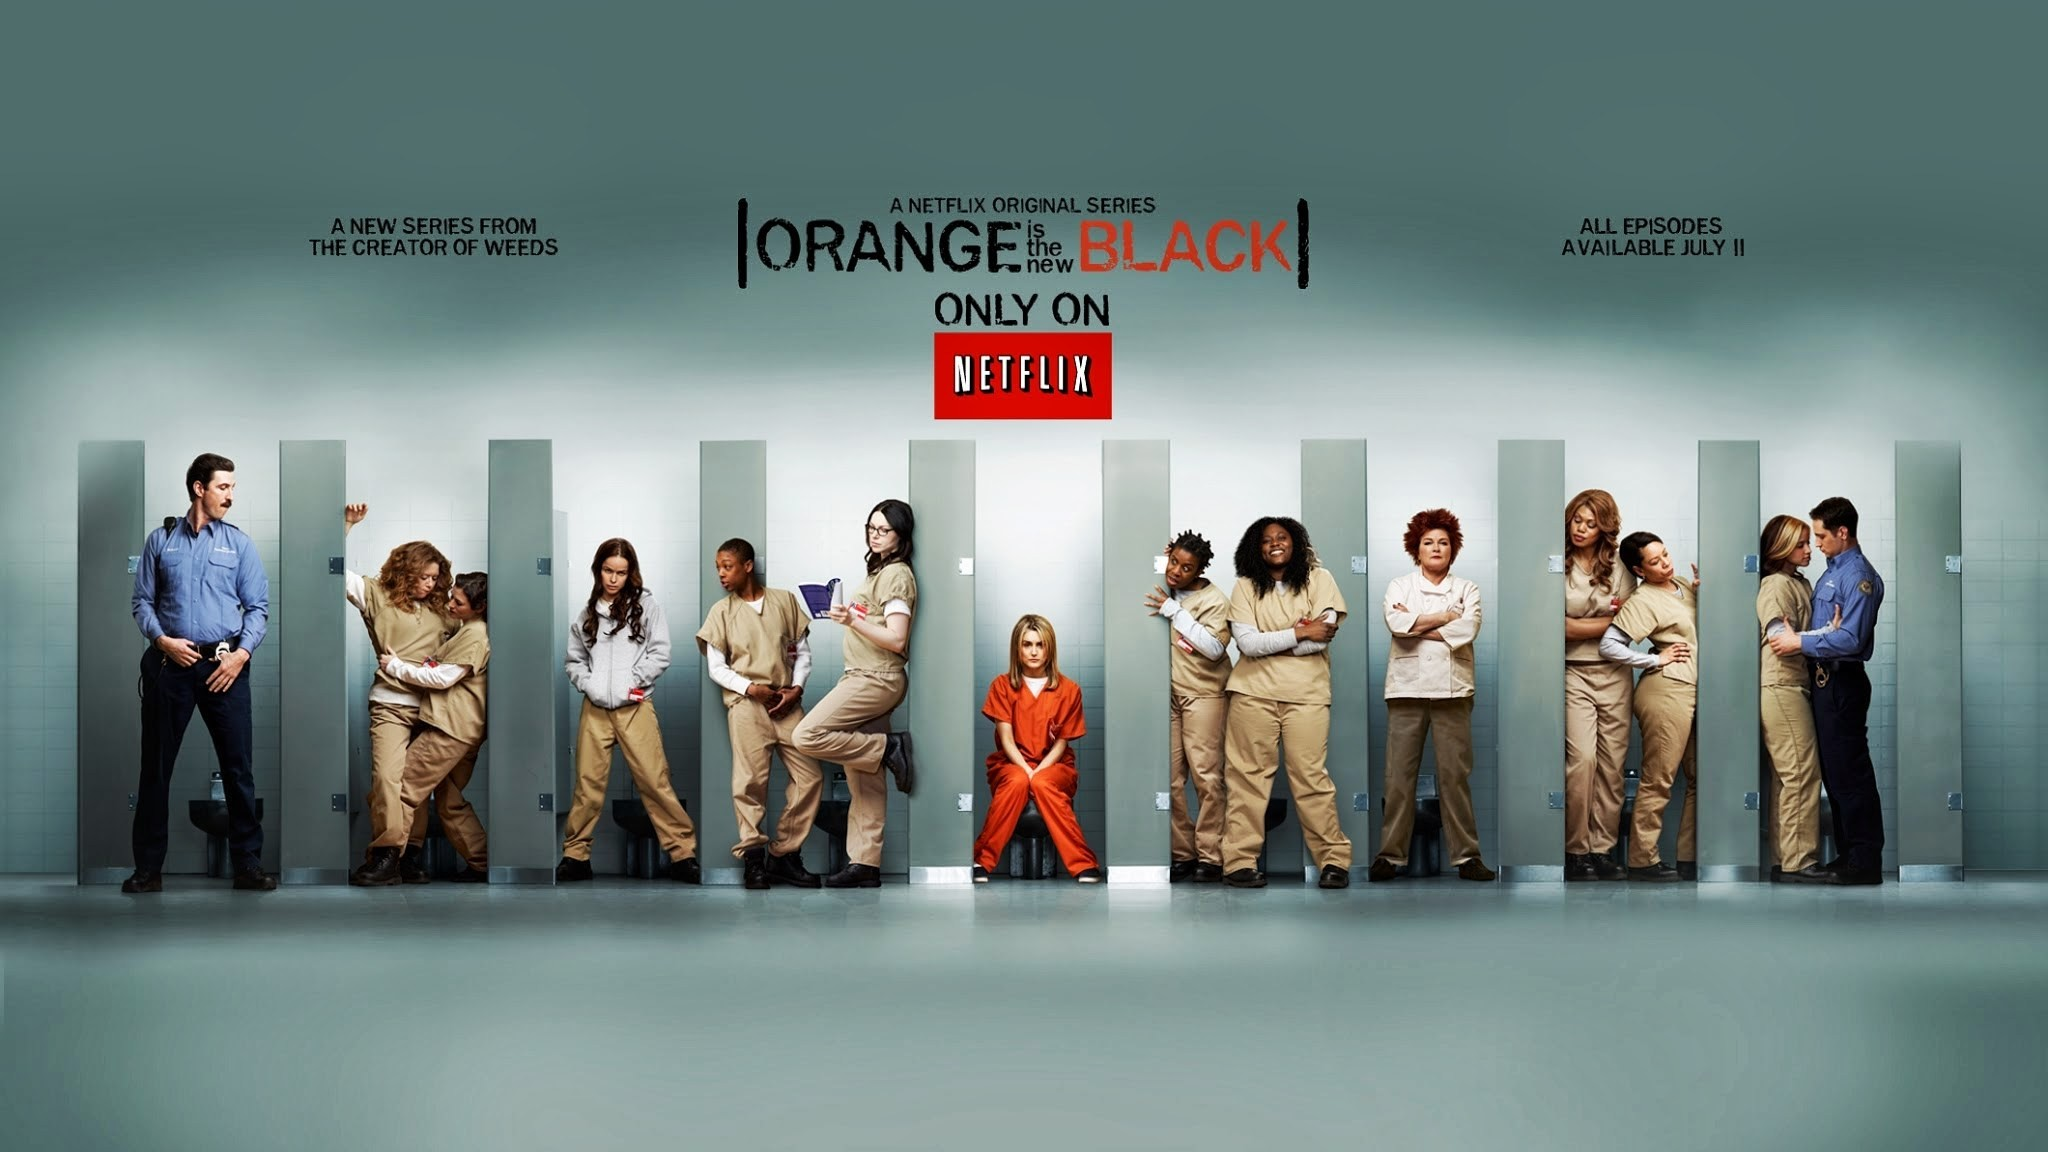 Orange is the new black netflix wallpaper